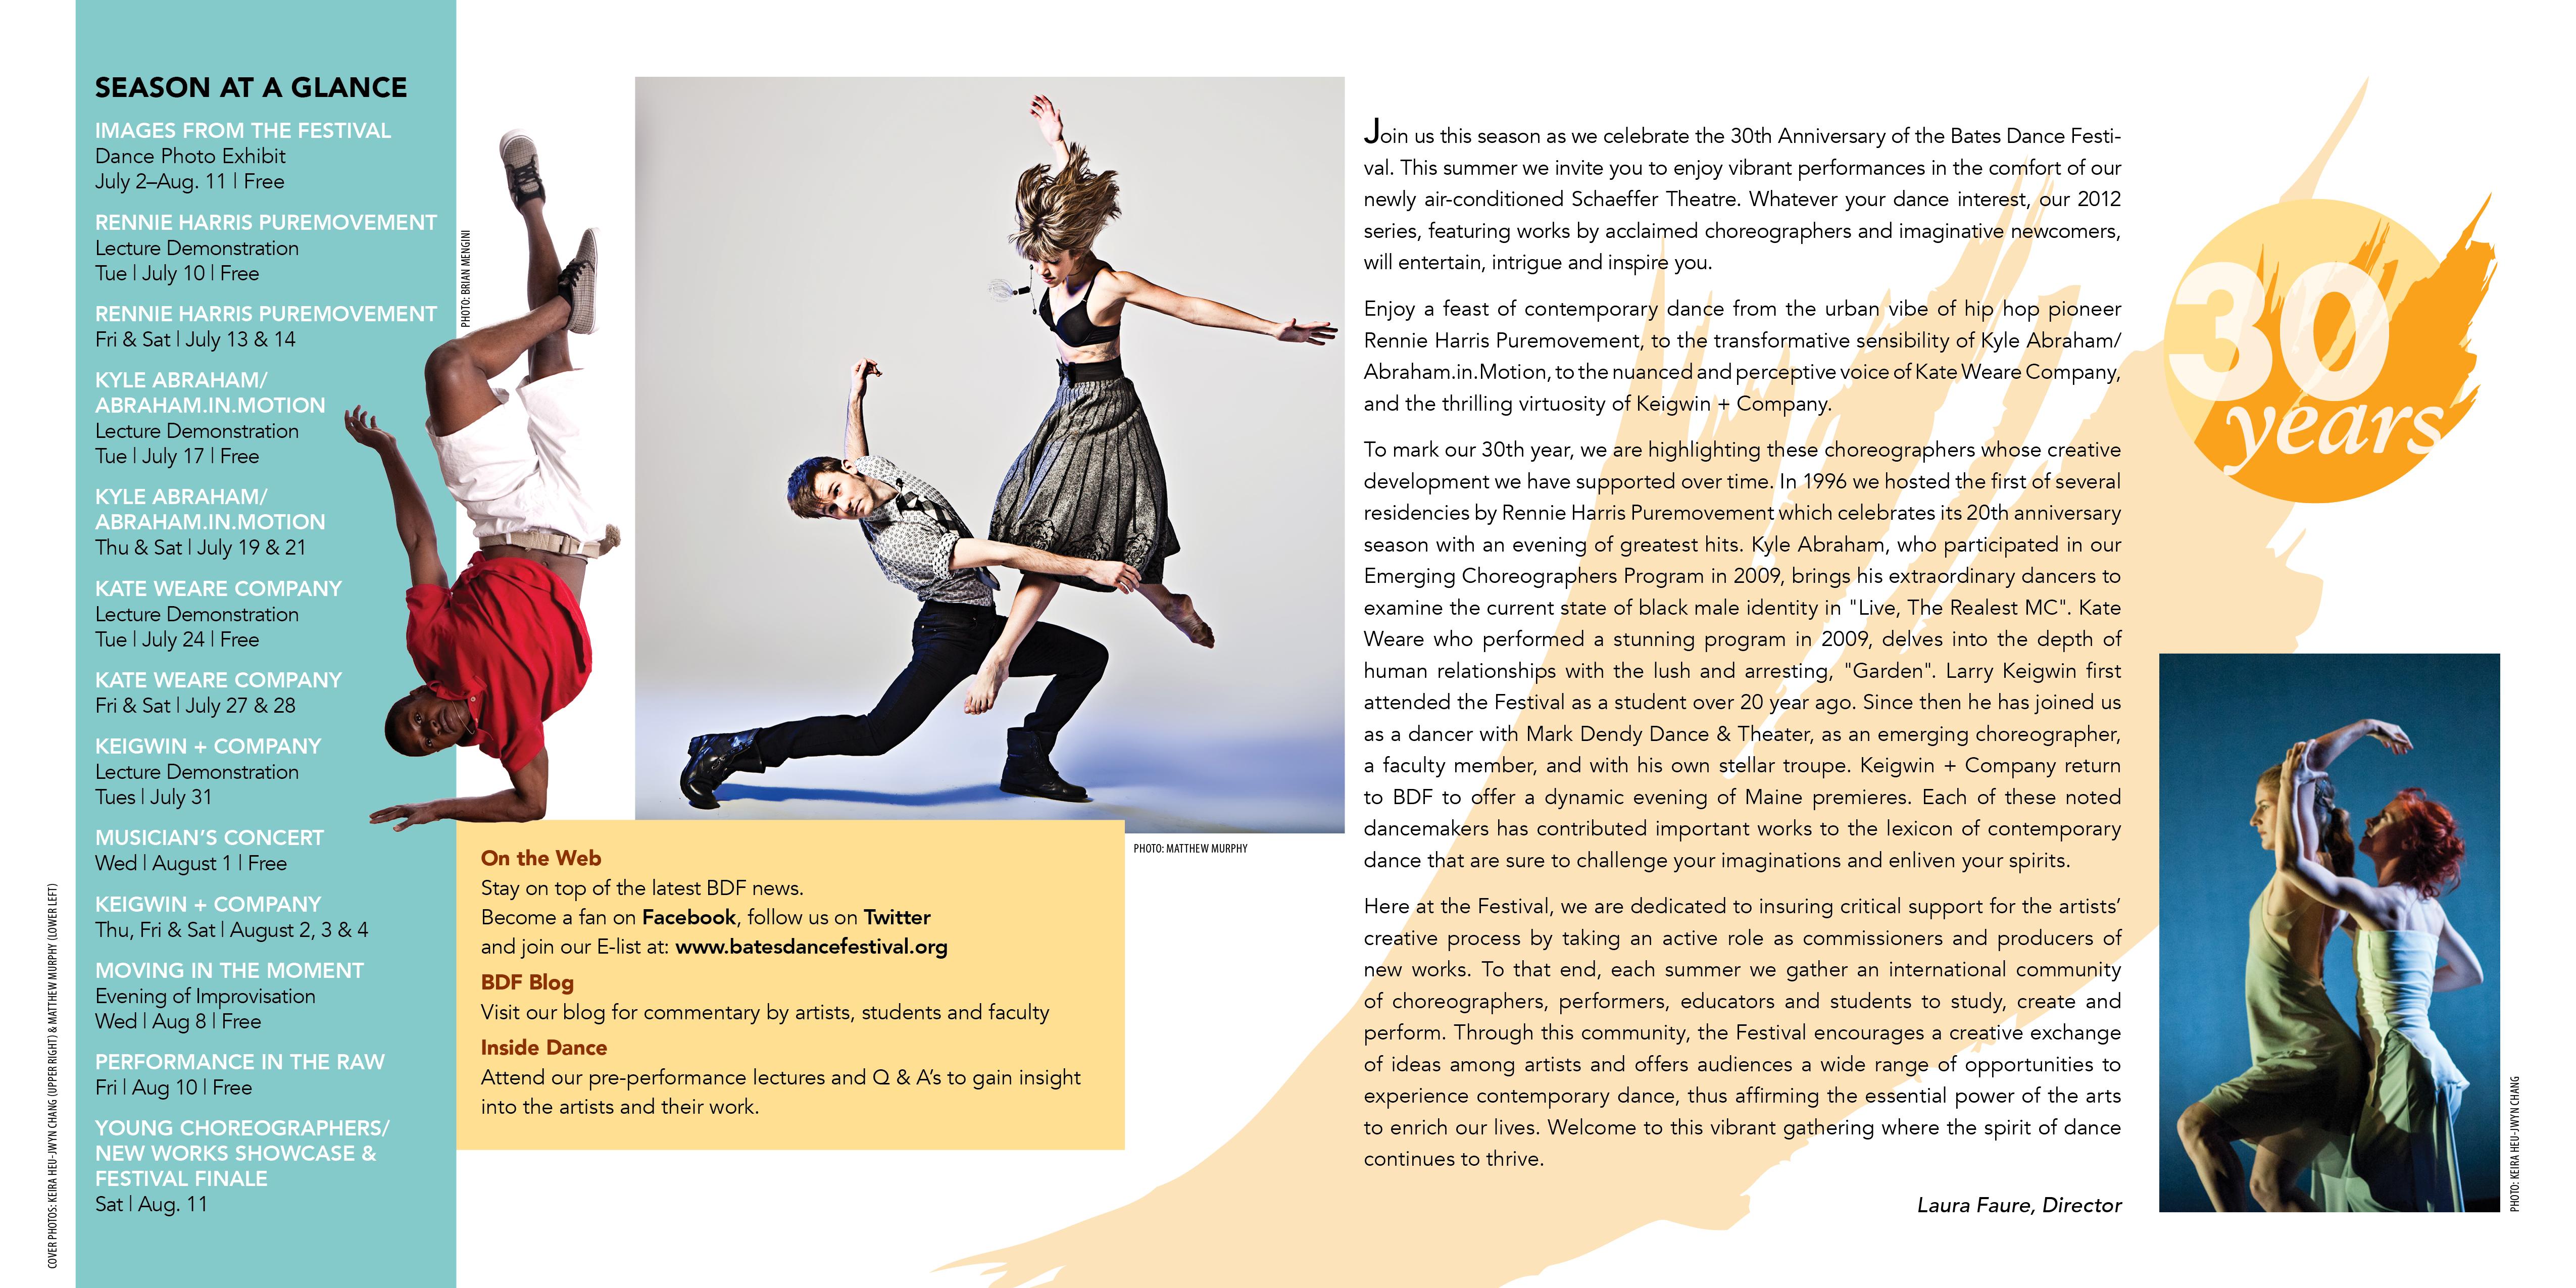 Opening spread for BATES DANCE FESTIVAL CATALOG